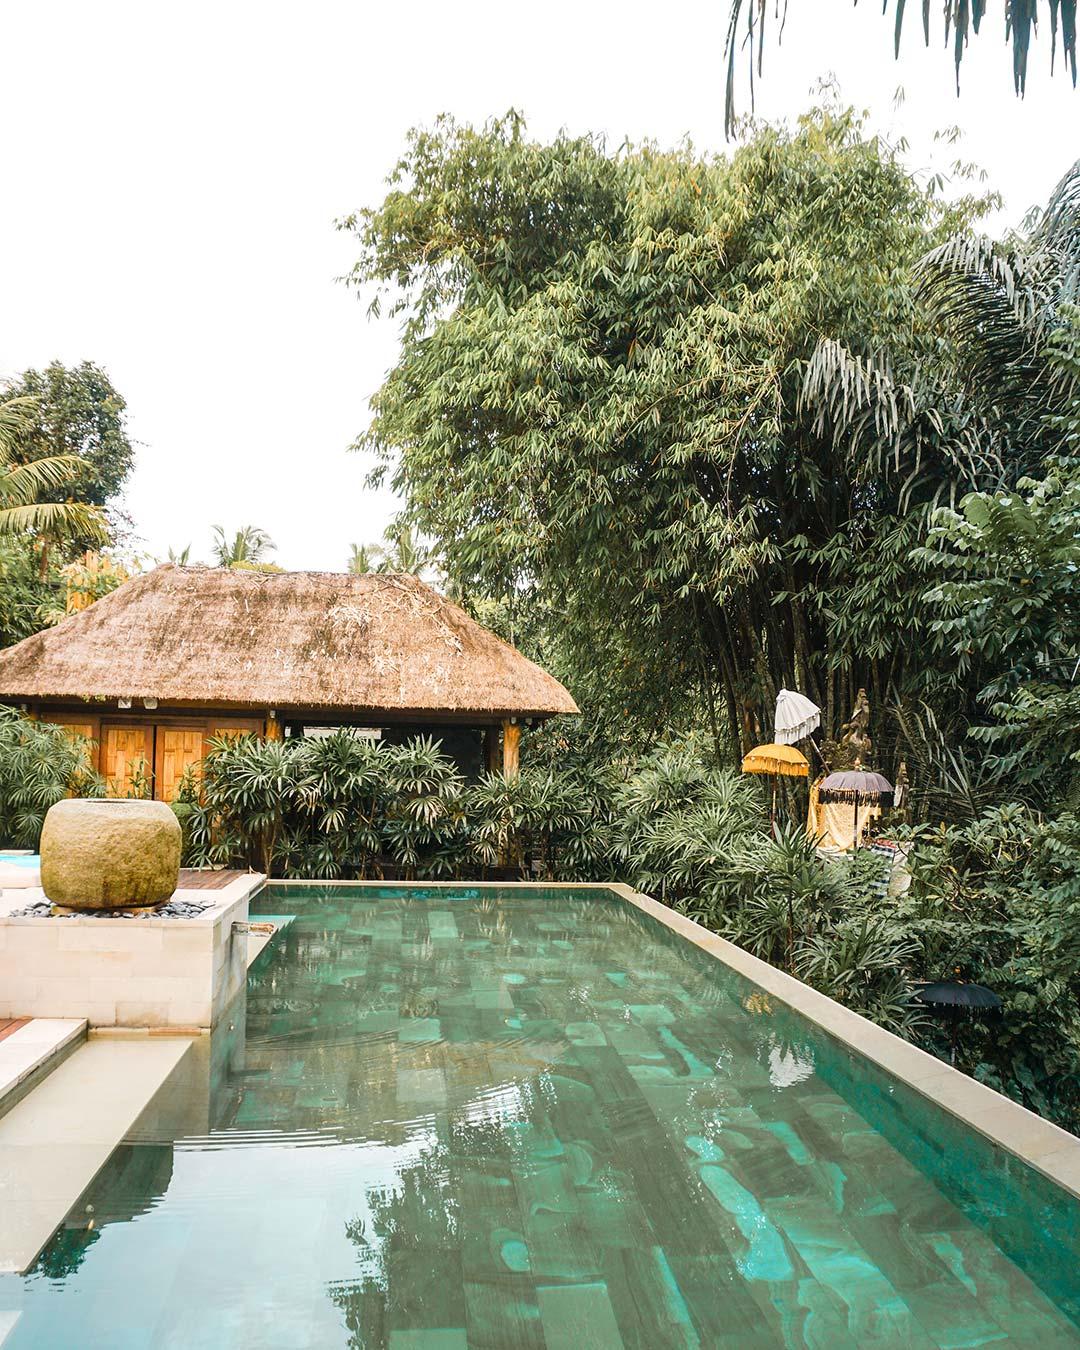 The Purist Villa Pool